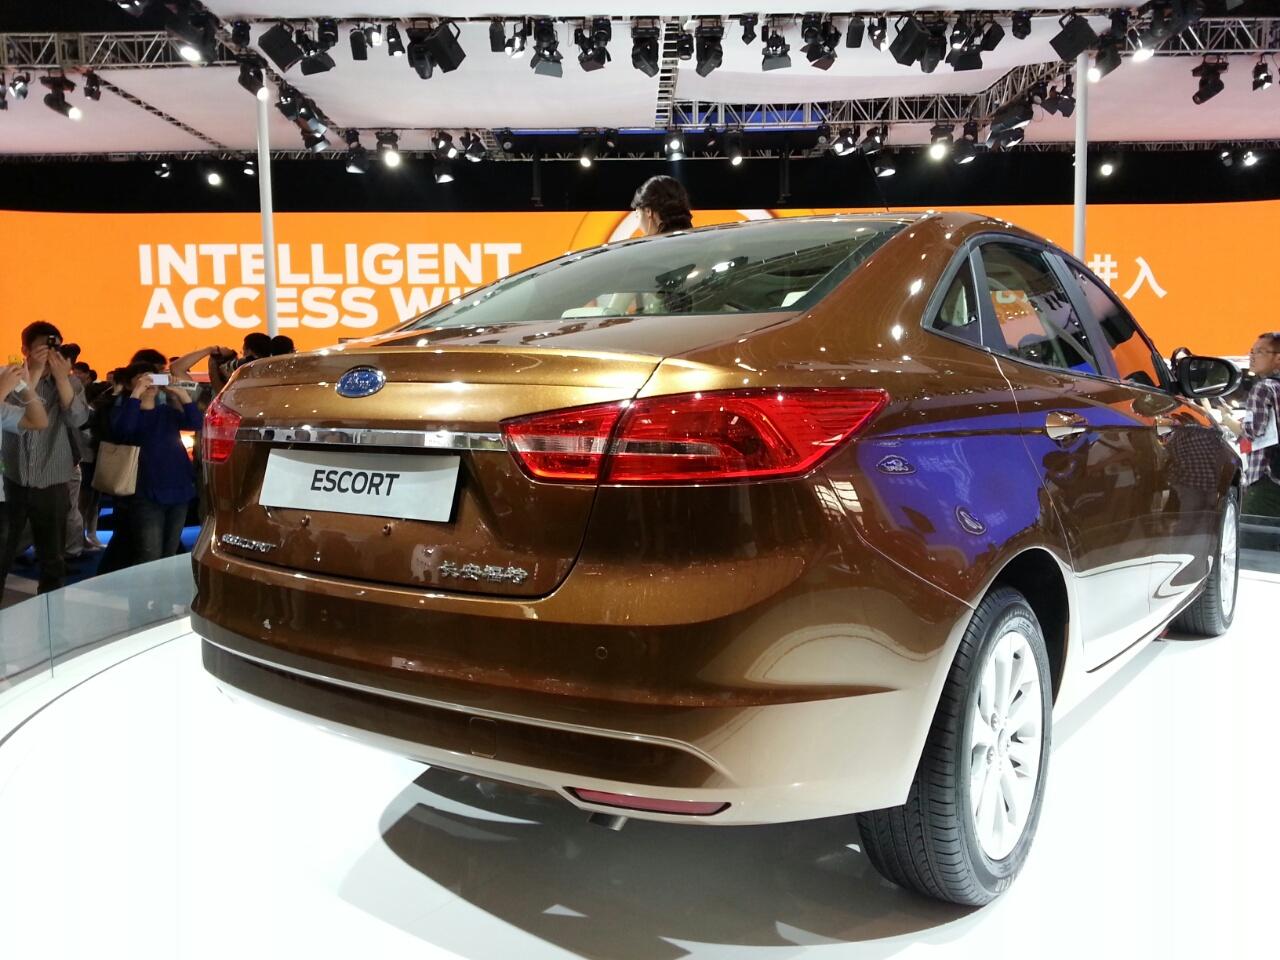 Ford Escort taillamp at Auto China 2014